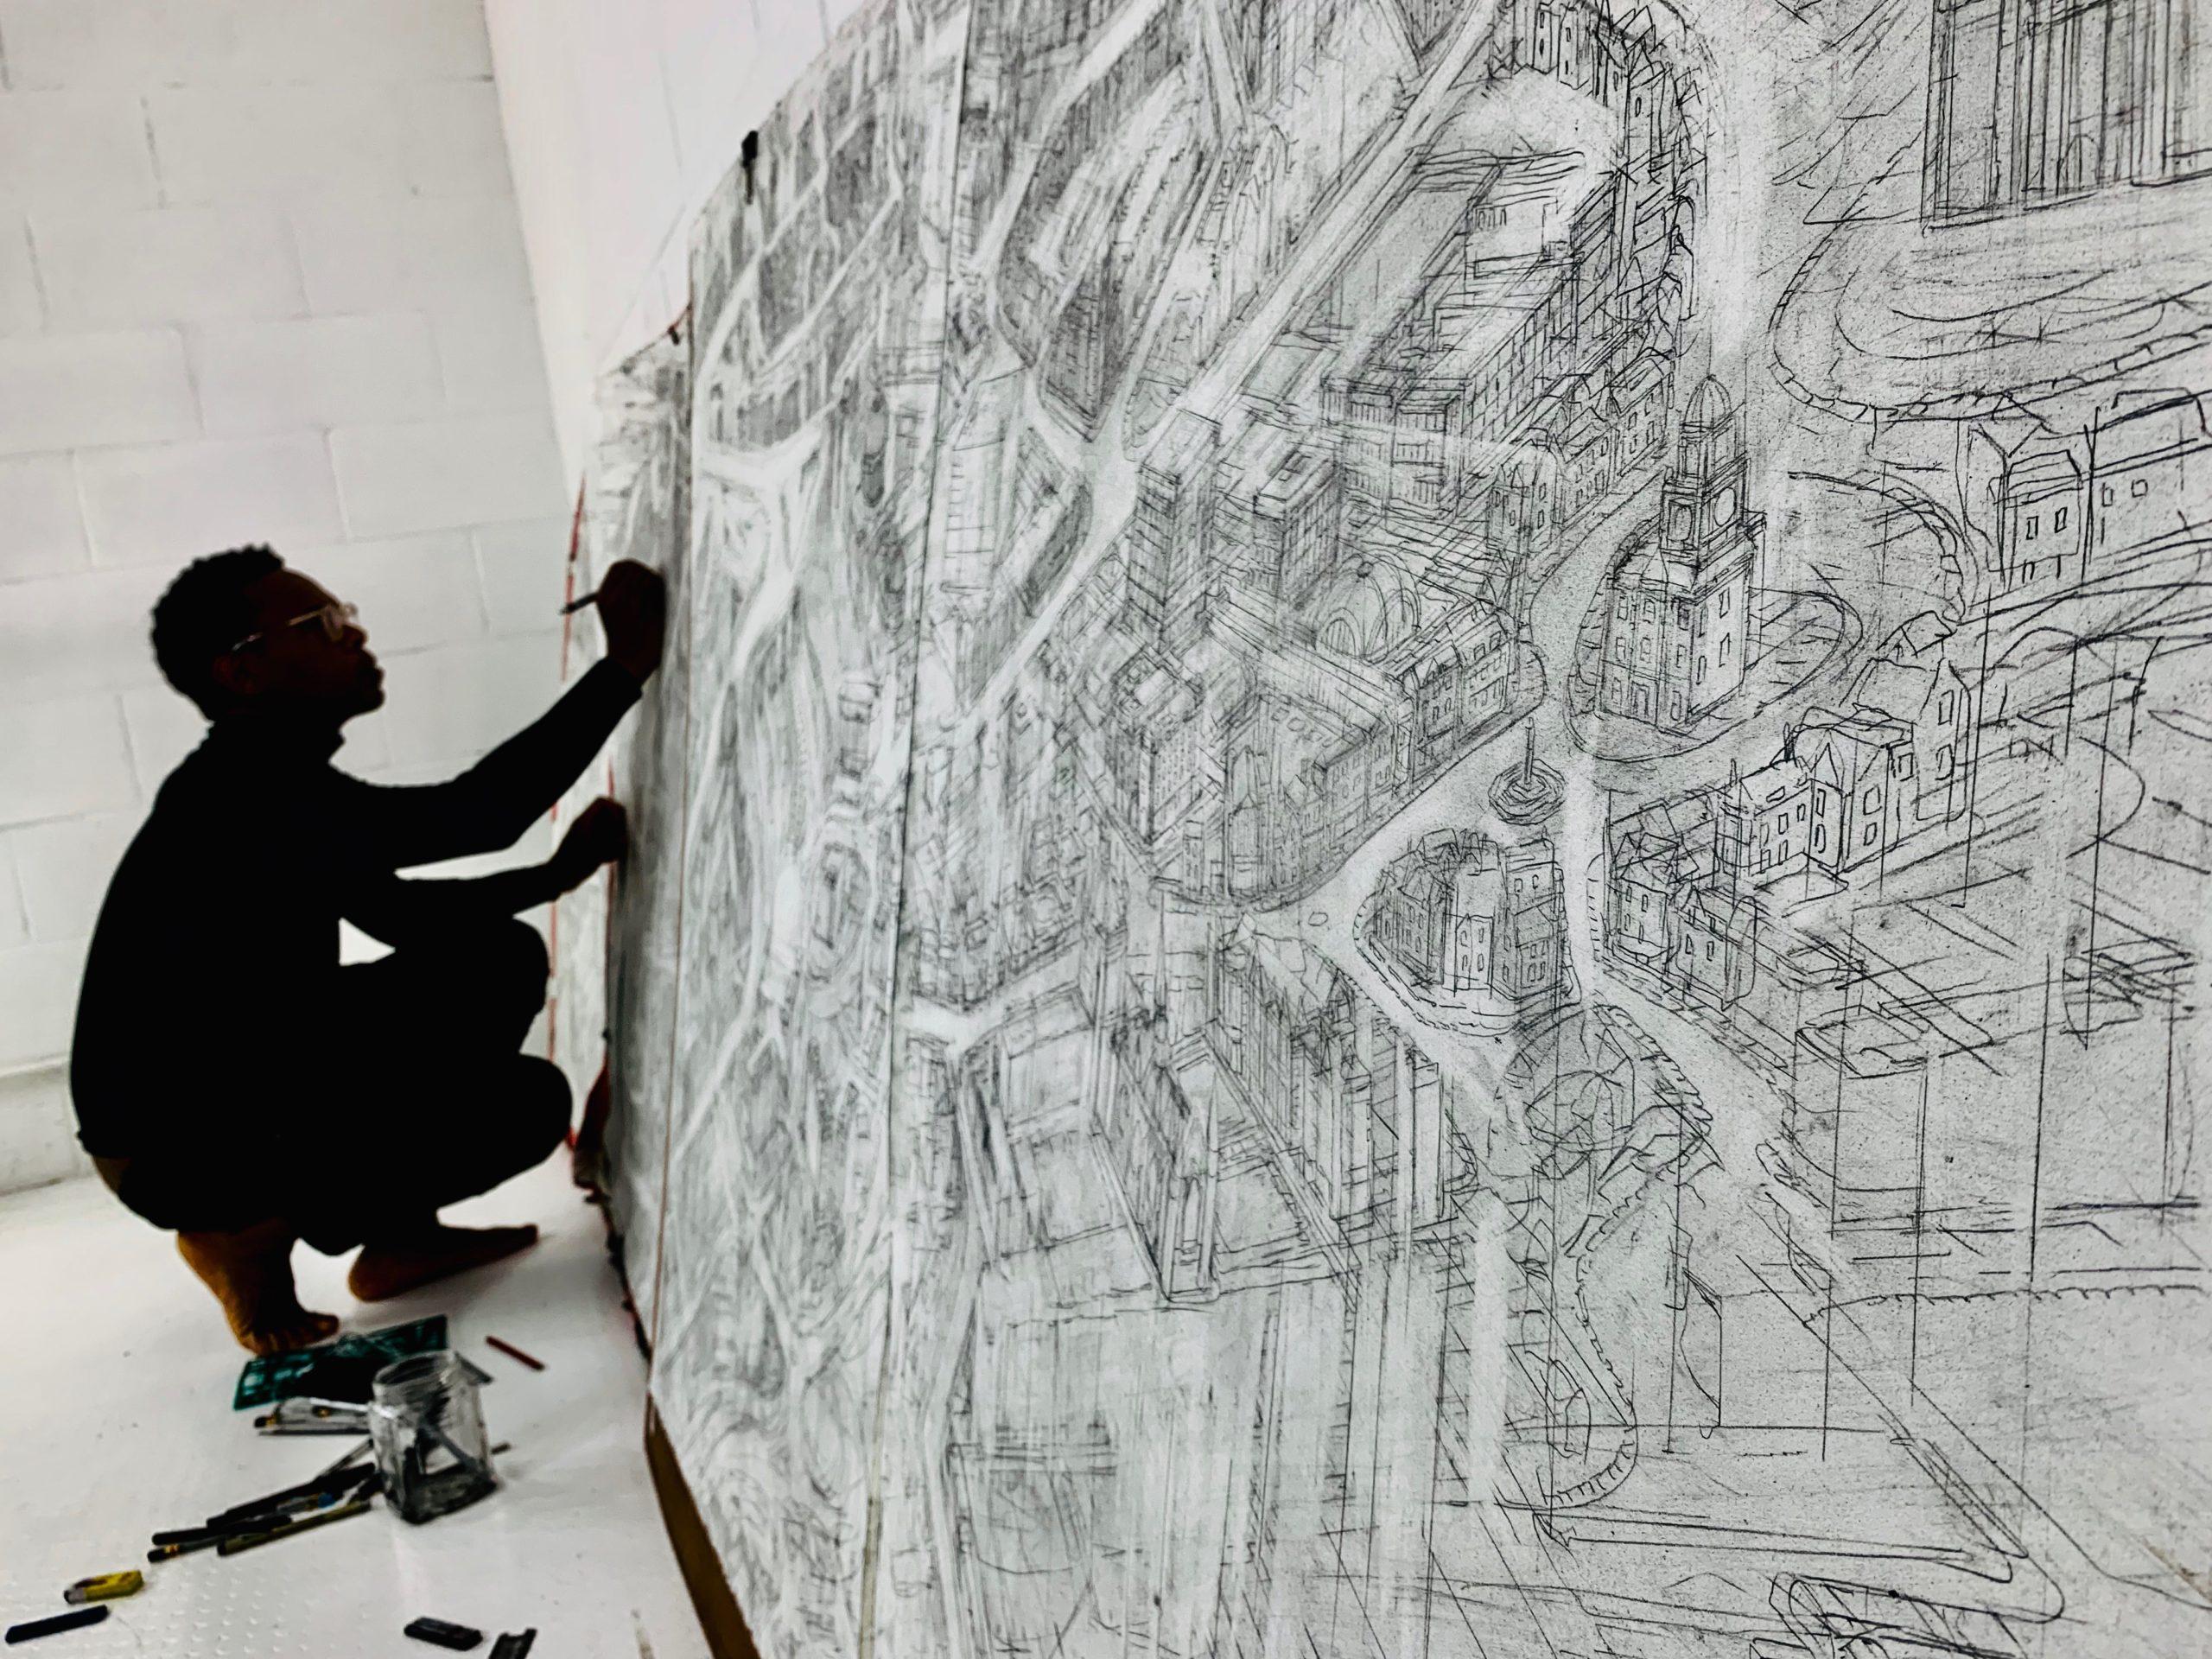 Carl Lavia sketching Aberdeen